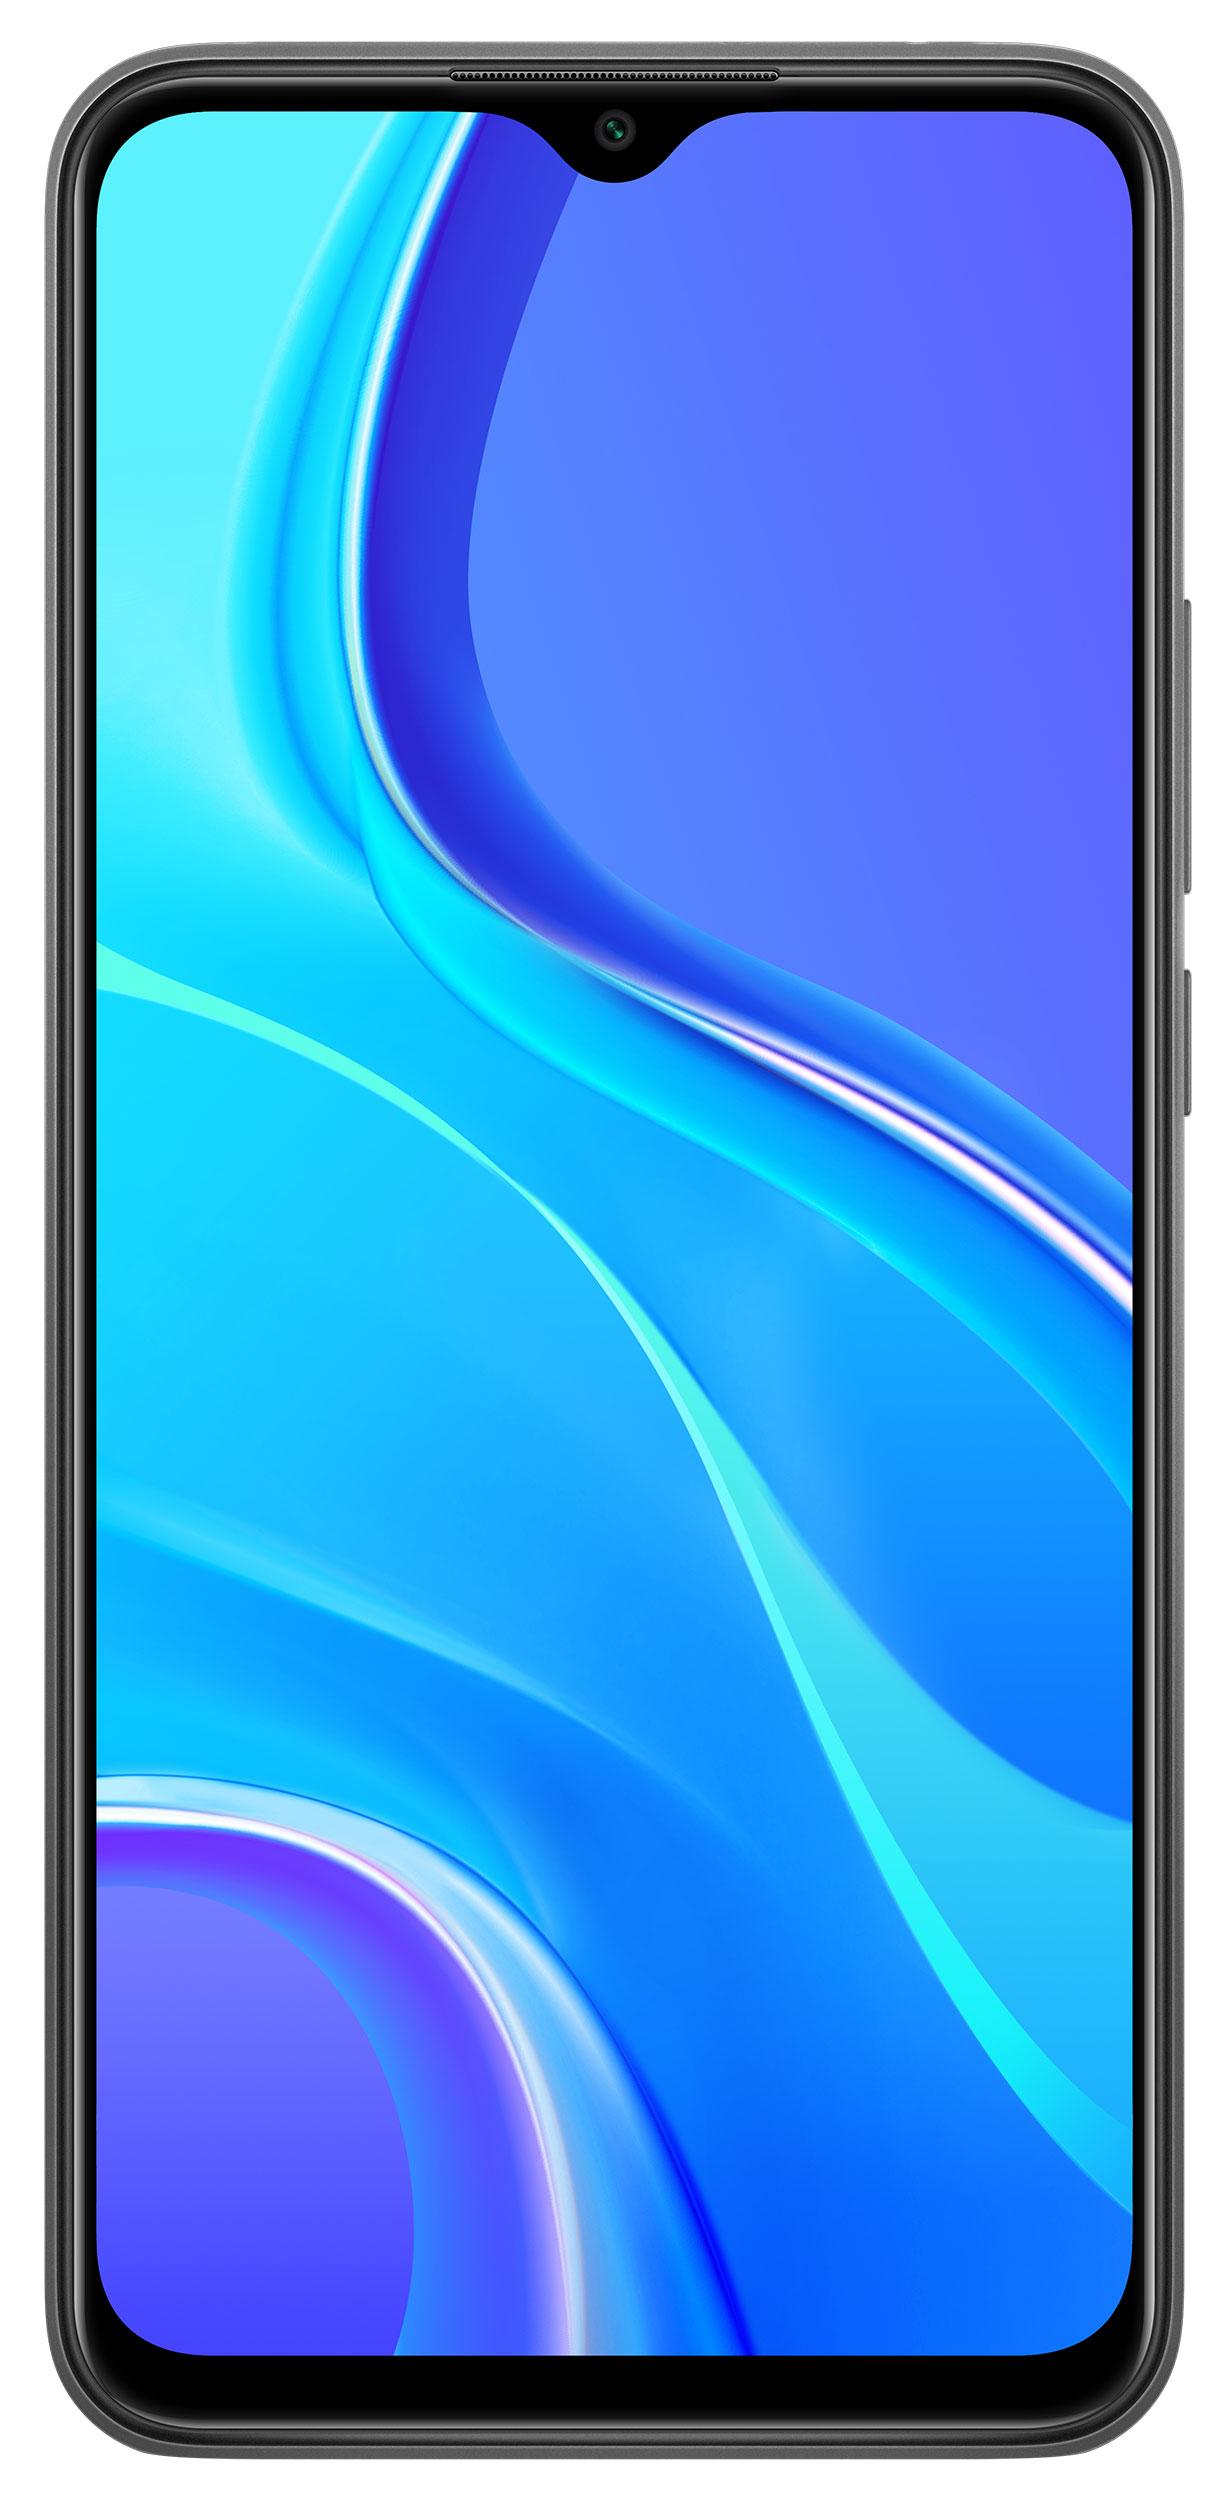 Smartphone Redmi 9 - Global - 3+32GB - Gri